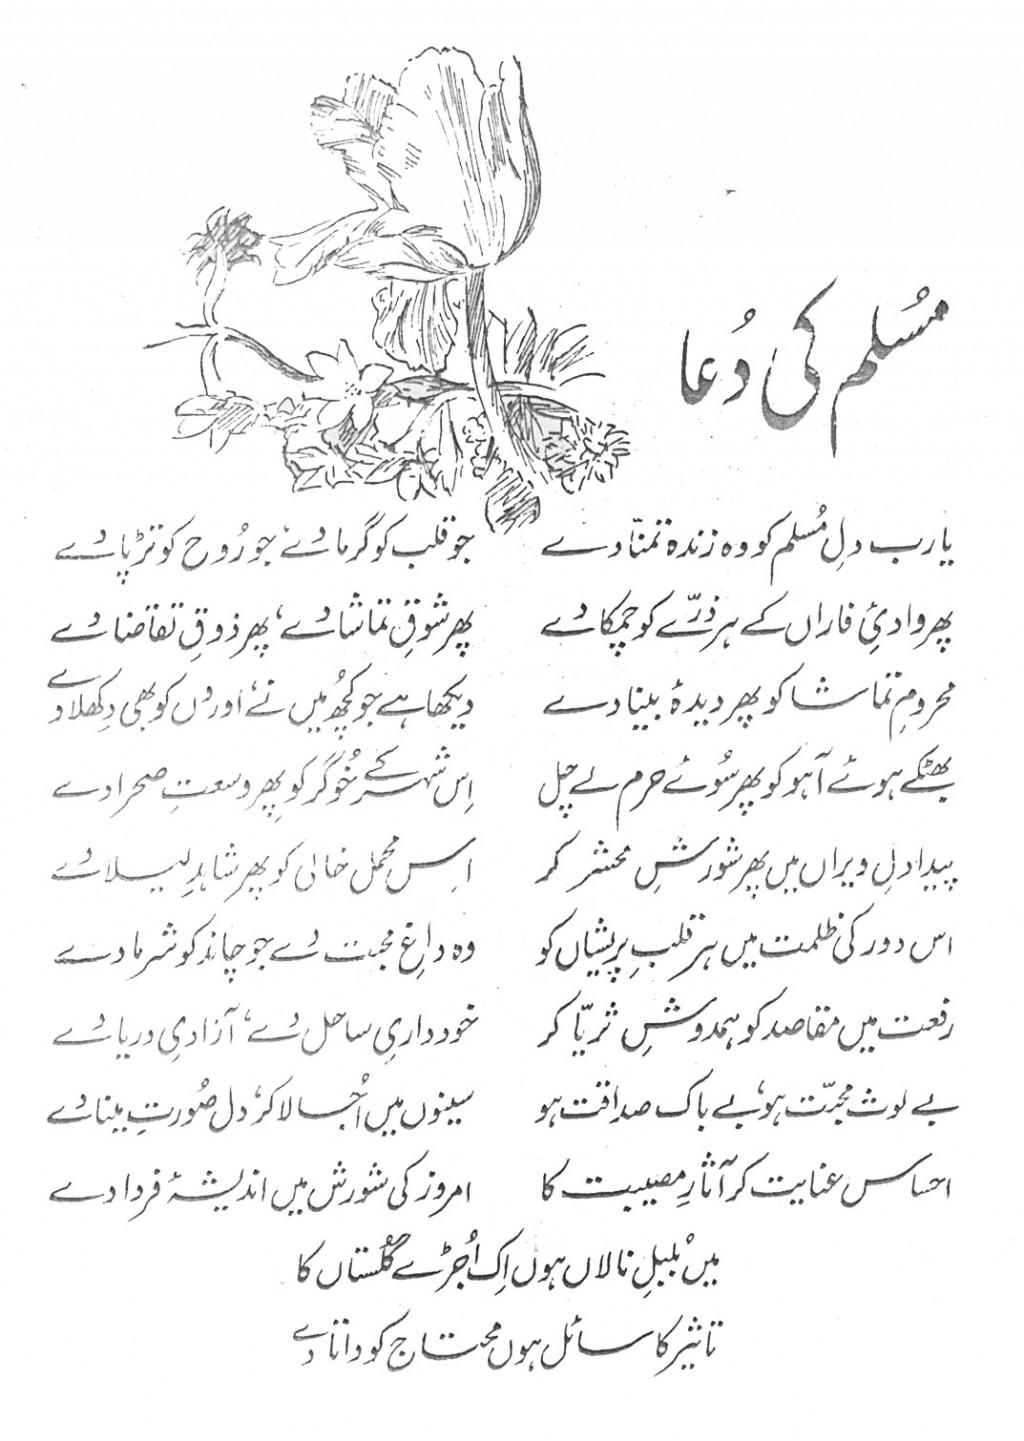 012 Essay Example Harkat Mein Barkat In Urdu Amazing On Topic Hai Short Large